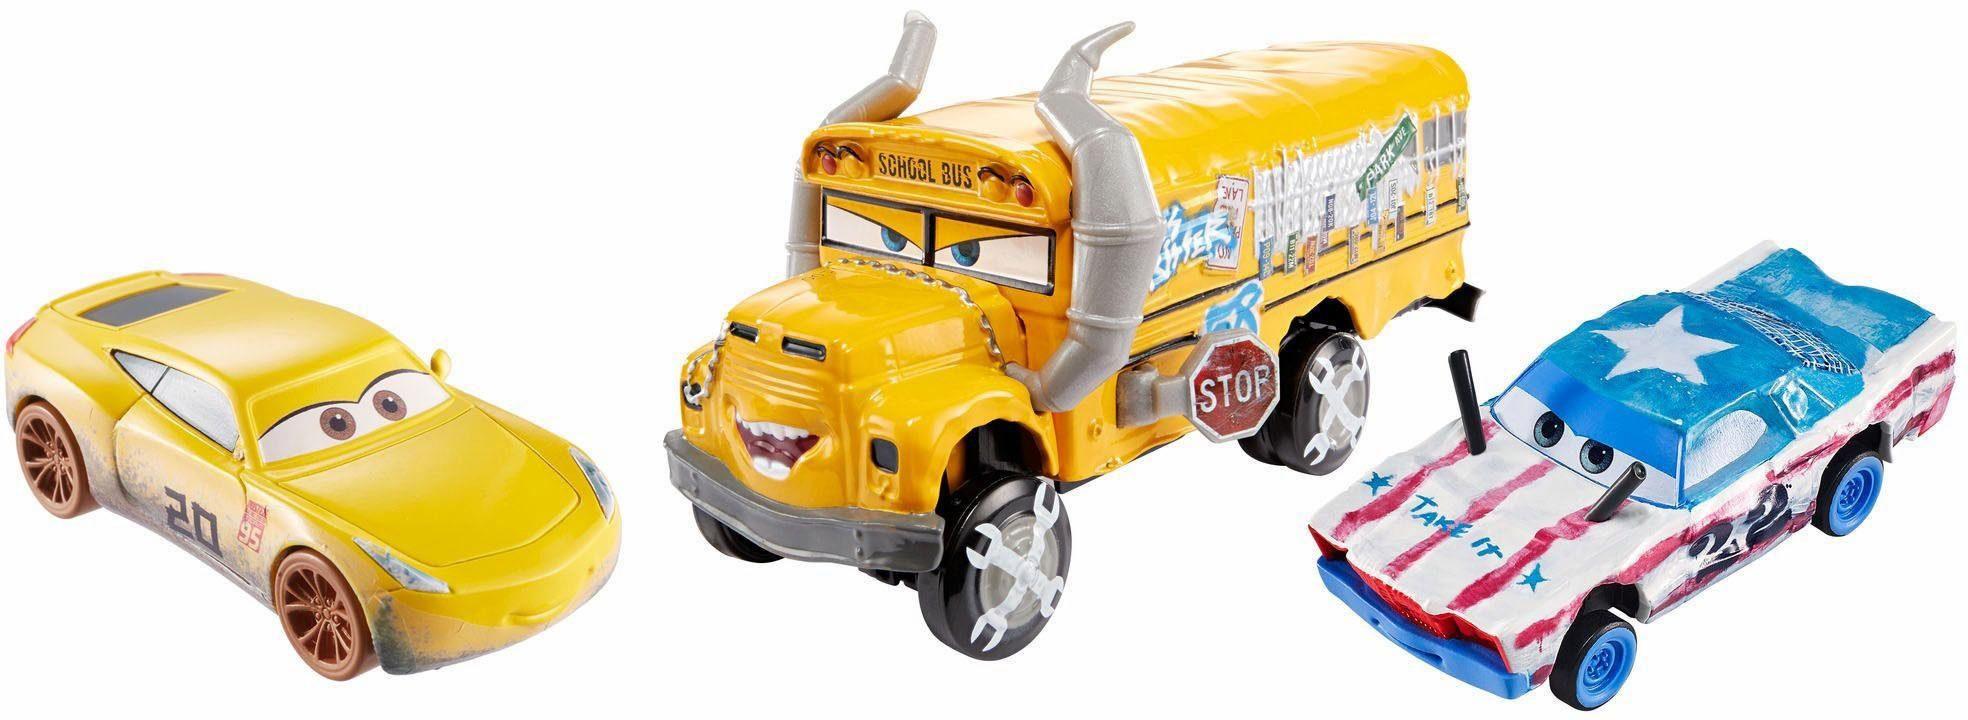 Mattel Spielzeugautoset, »Disney Cars 3 Die-Cast Cruz Ramirez, Cigalert, Miss Fritter«